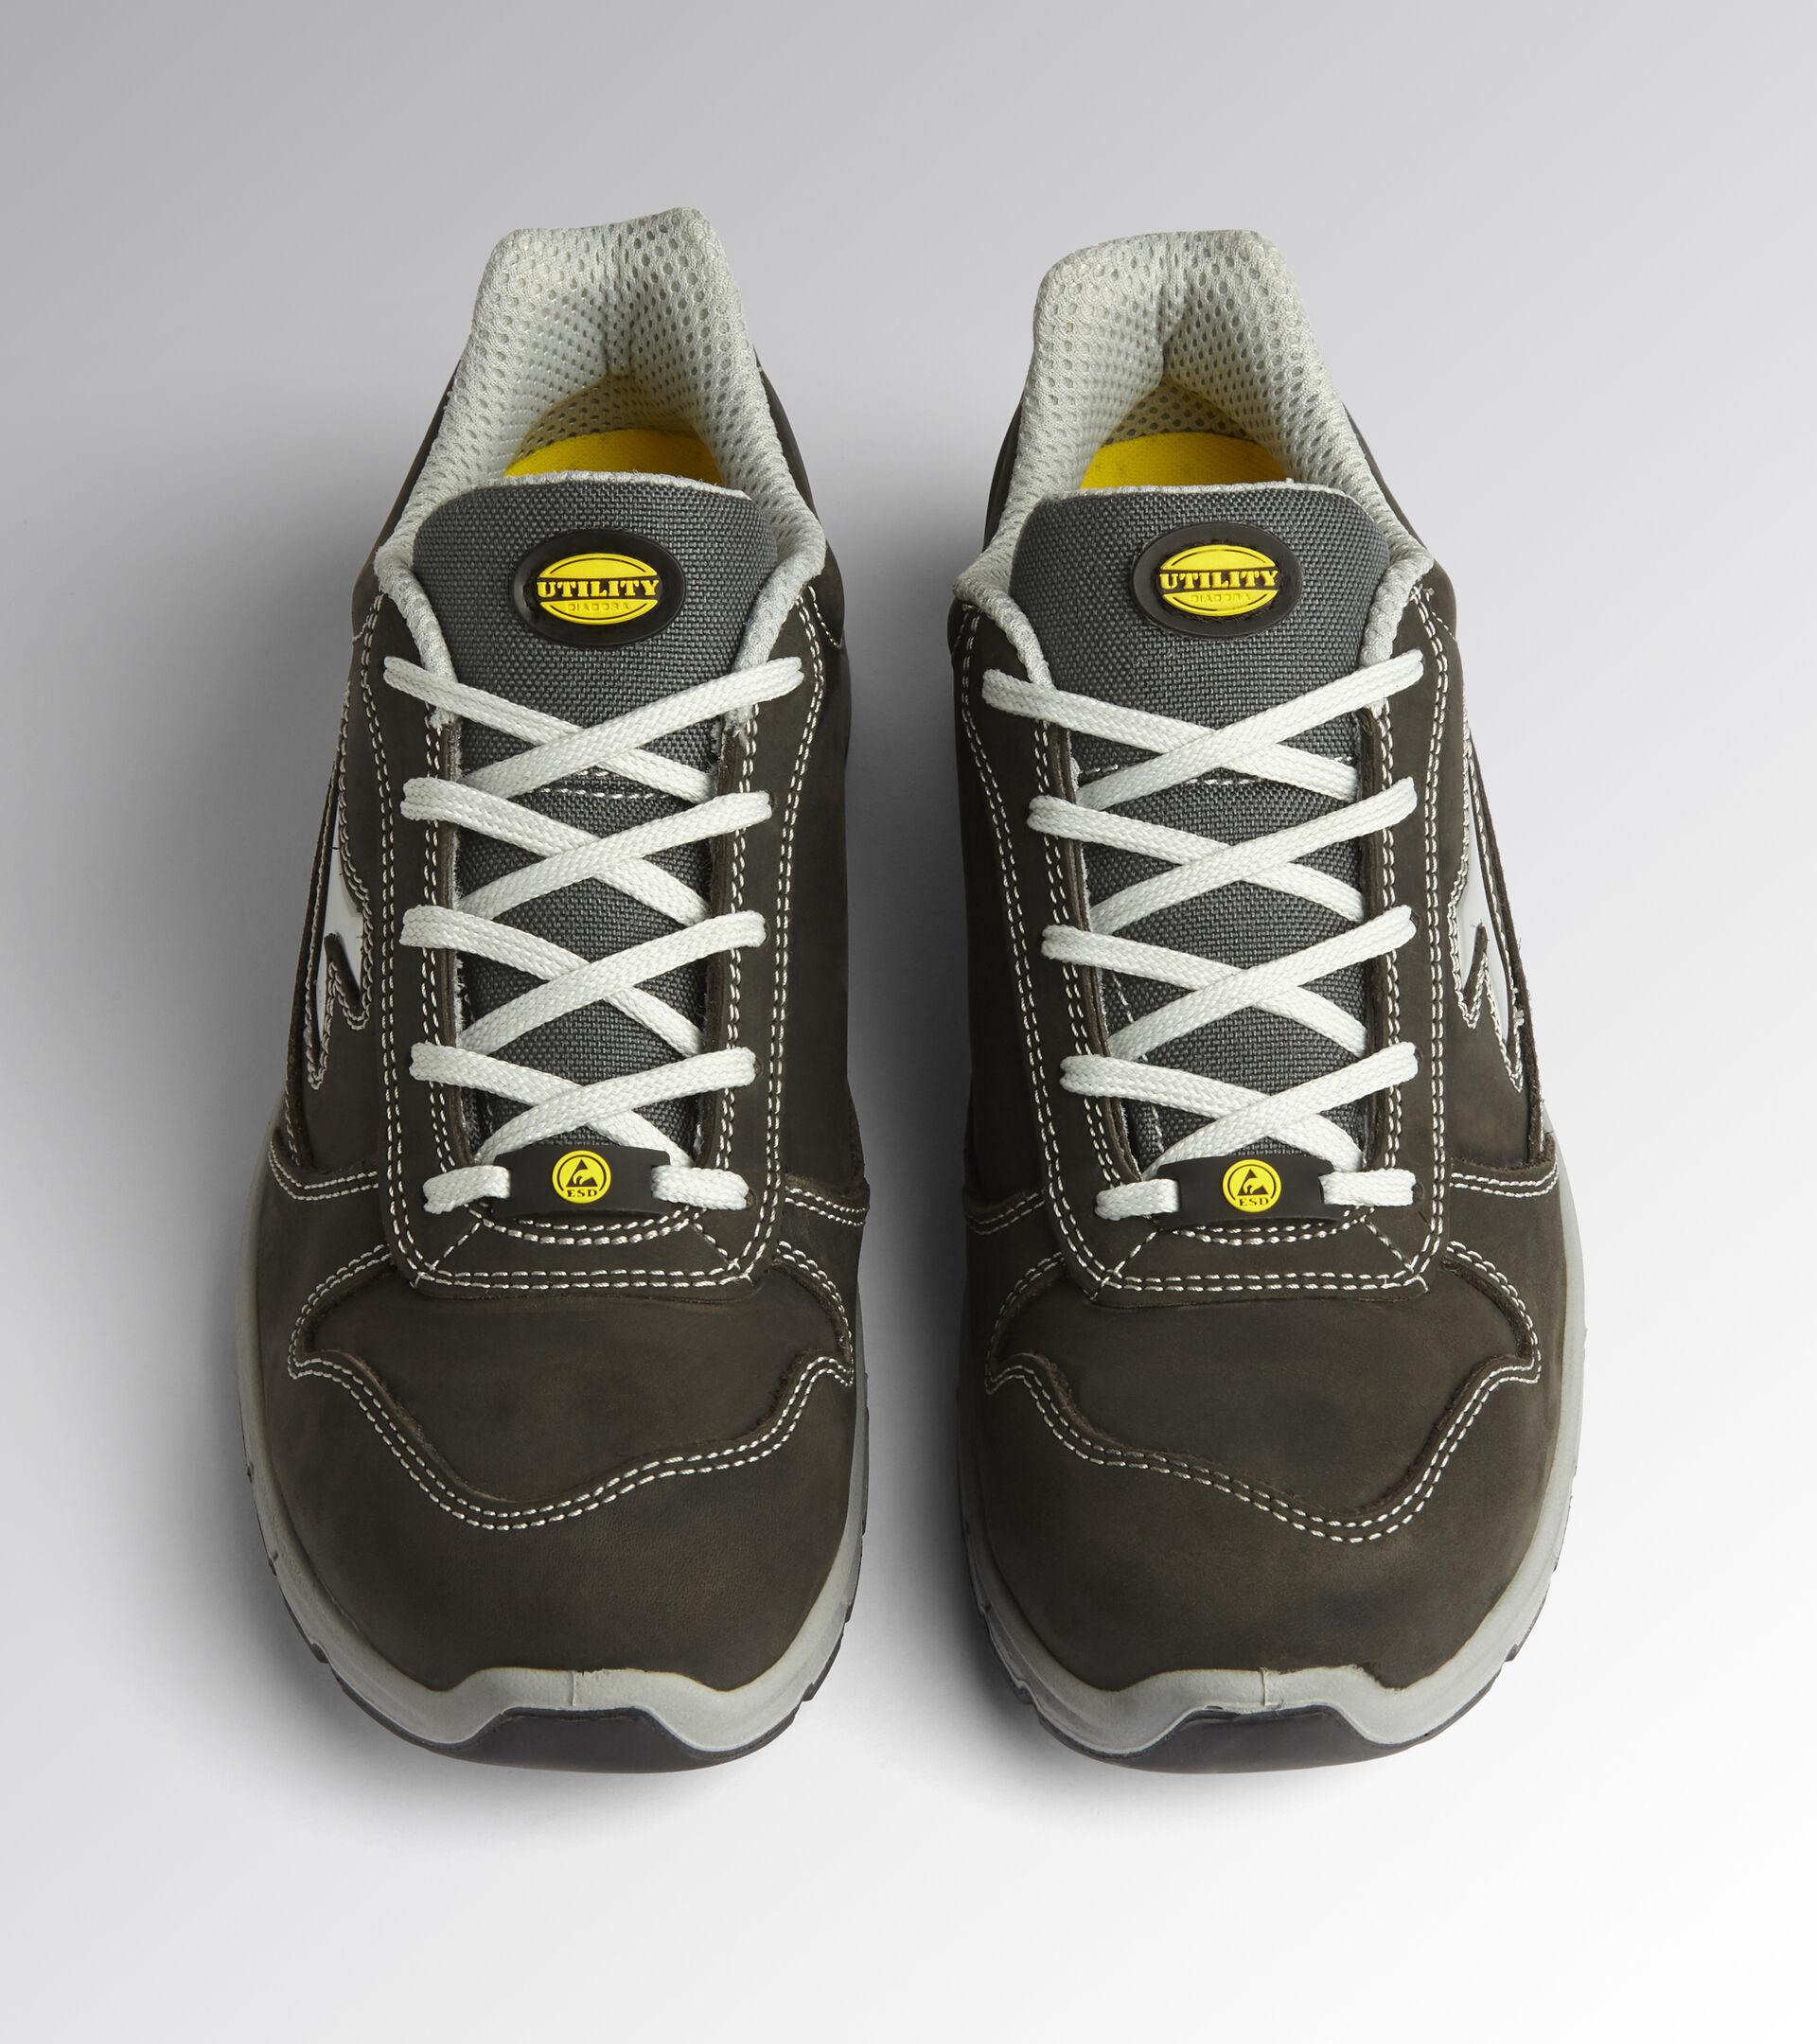 Footwear Utility UNISEX RUN LOW S3 SRC ESD SCHLOSSSTEIN Utility